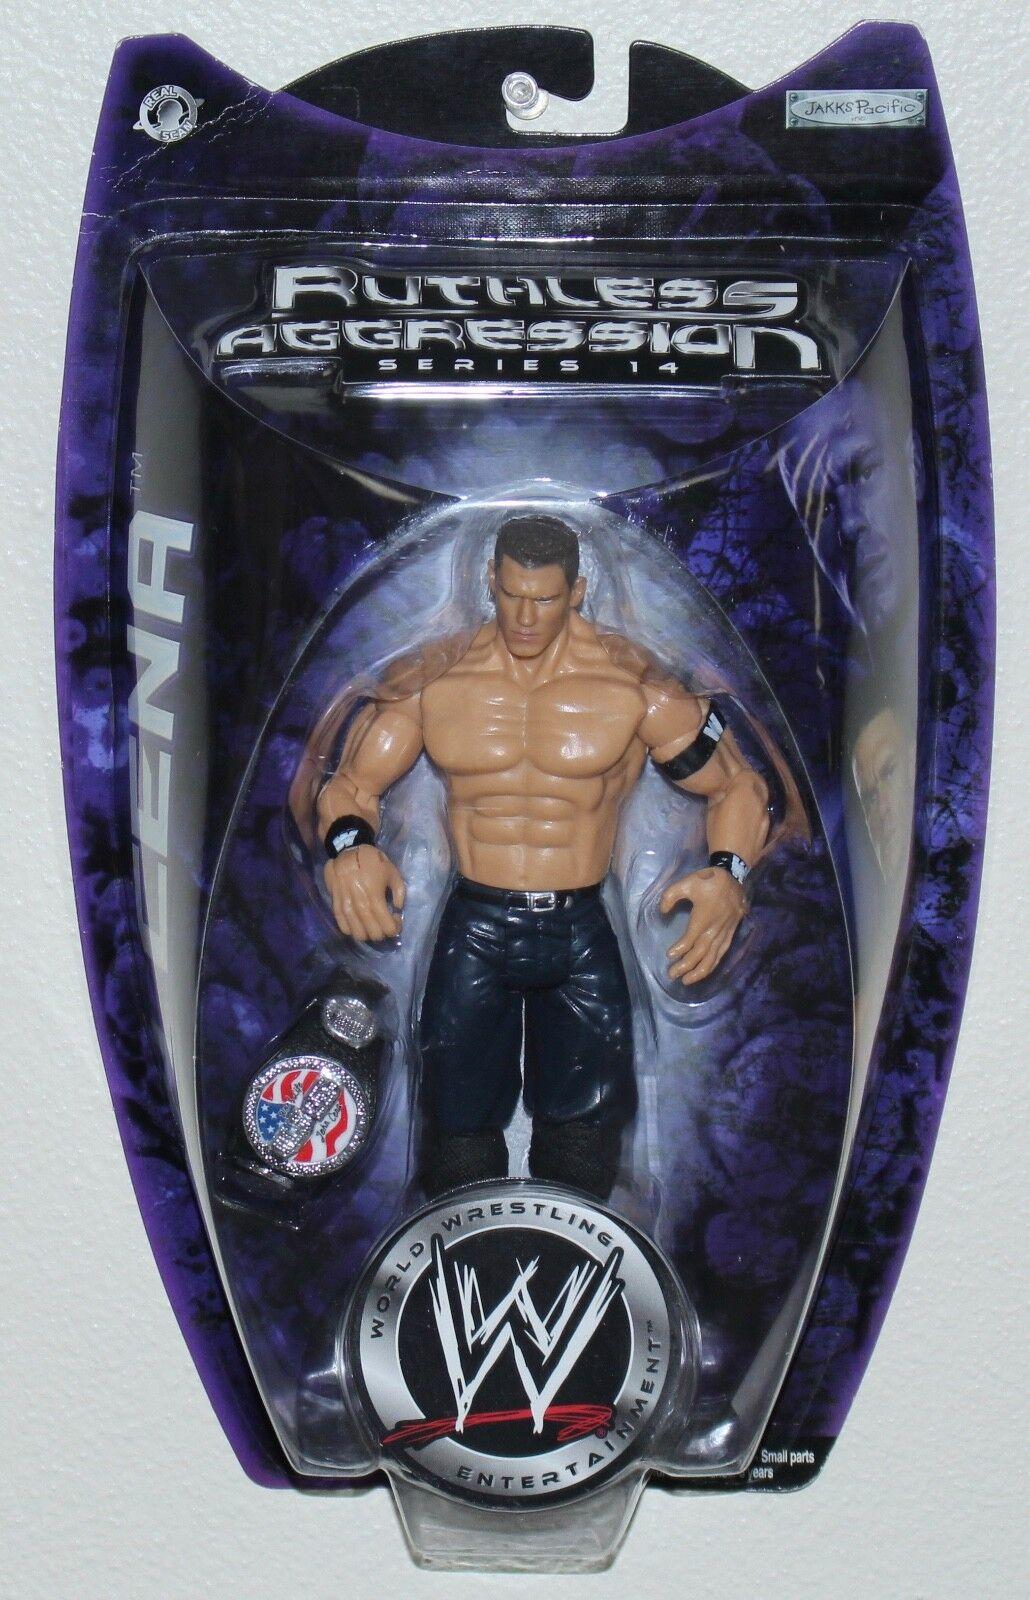 WWE Ruthless Aggression Series Action Figure John Cena 2005 US Champ Belt Jakks